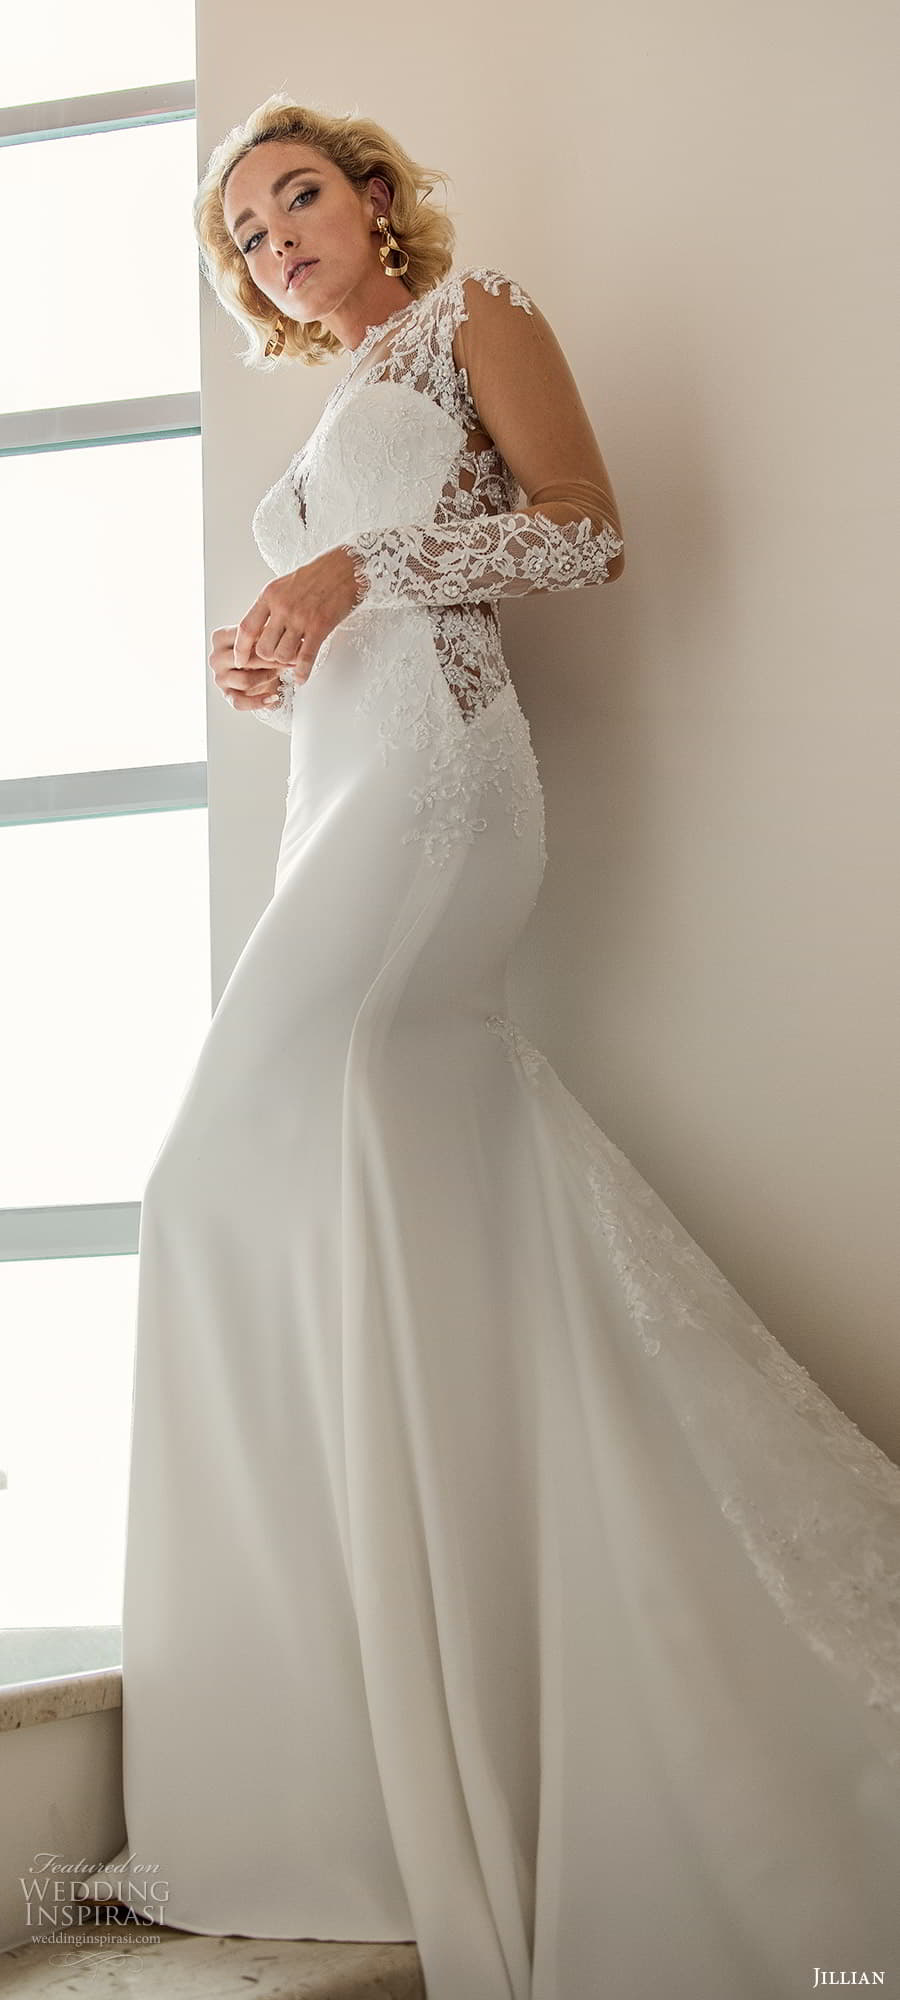 jillian 2022 bridal illusion long sleeve sheer high neck sweetheart neckline embellished bodice sheath wedding dress chapel train (1) lv